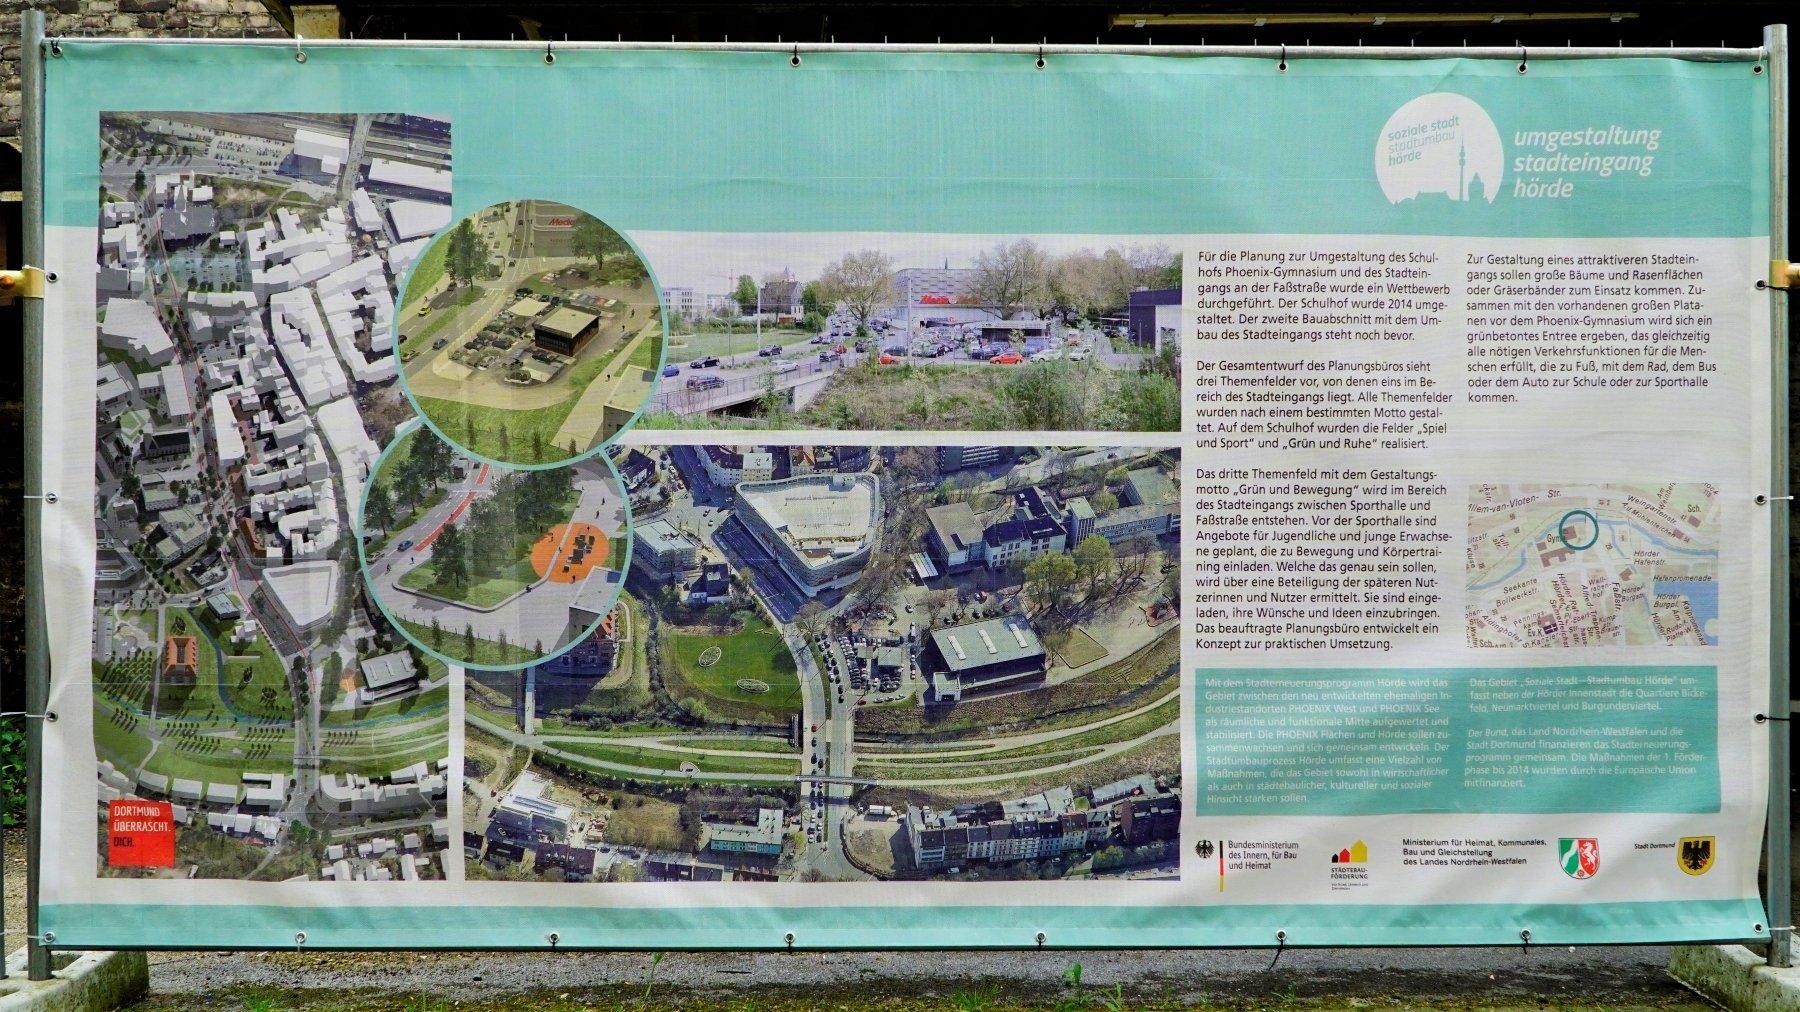 Neue Stadtumbauinfos in Hörde | IN-StadtMagazine Dortmund